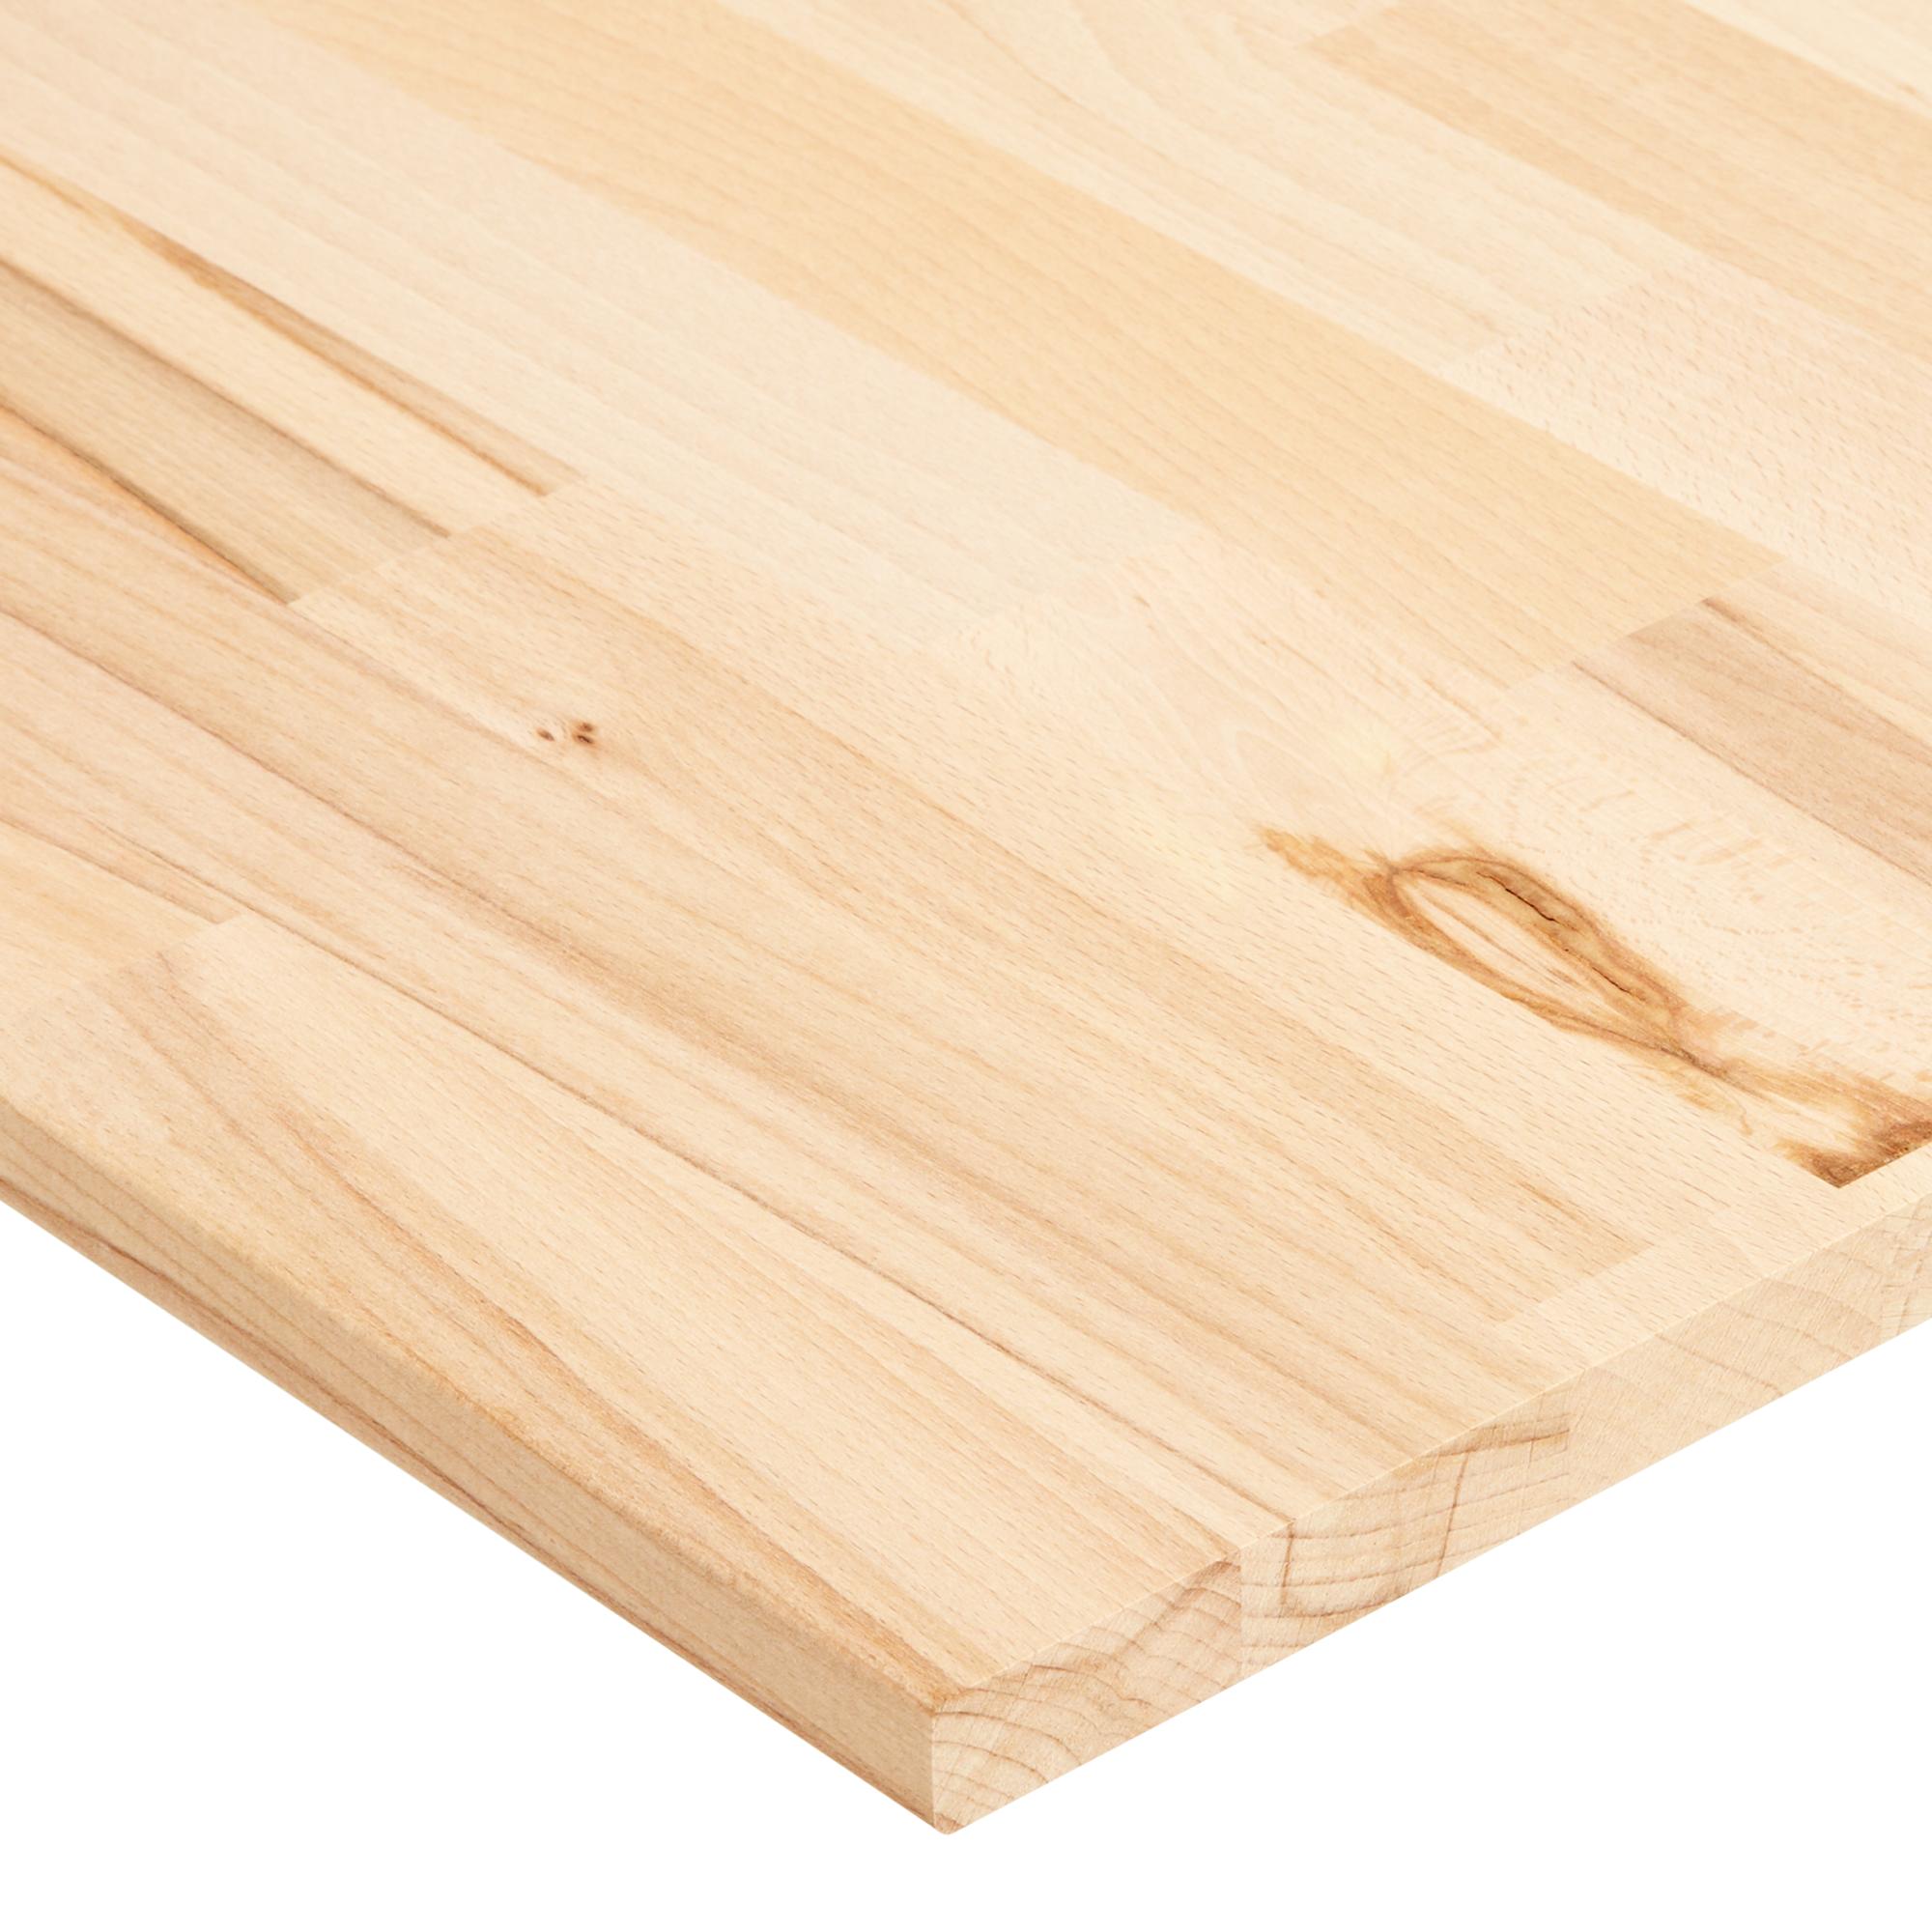 Toom Toom Massivholzplatte Buche 18 X 800 X 600 Mm ǀ Toom Baumarkt